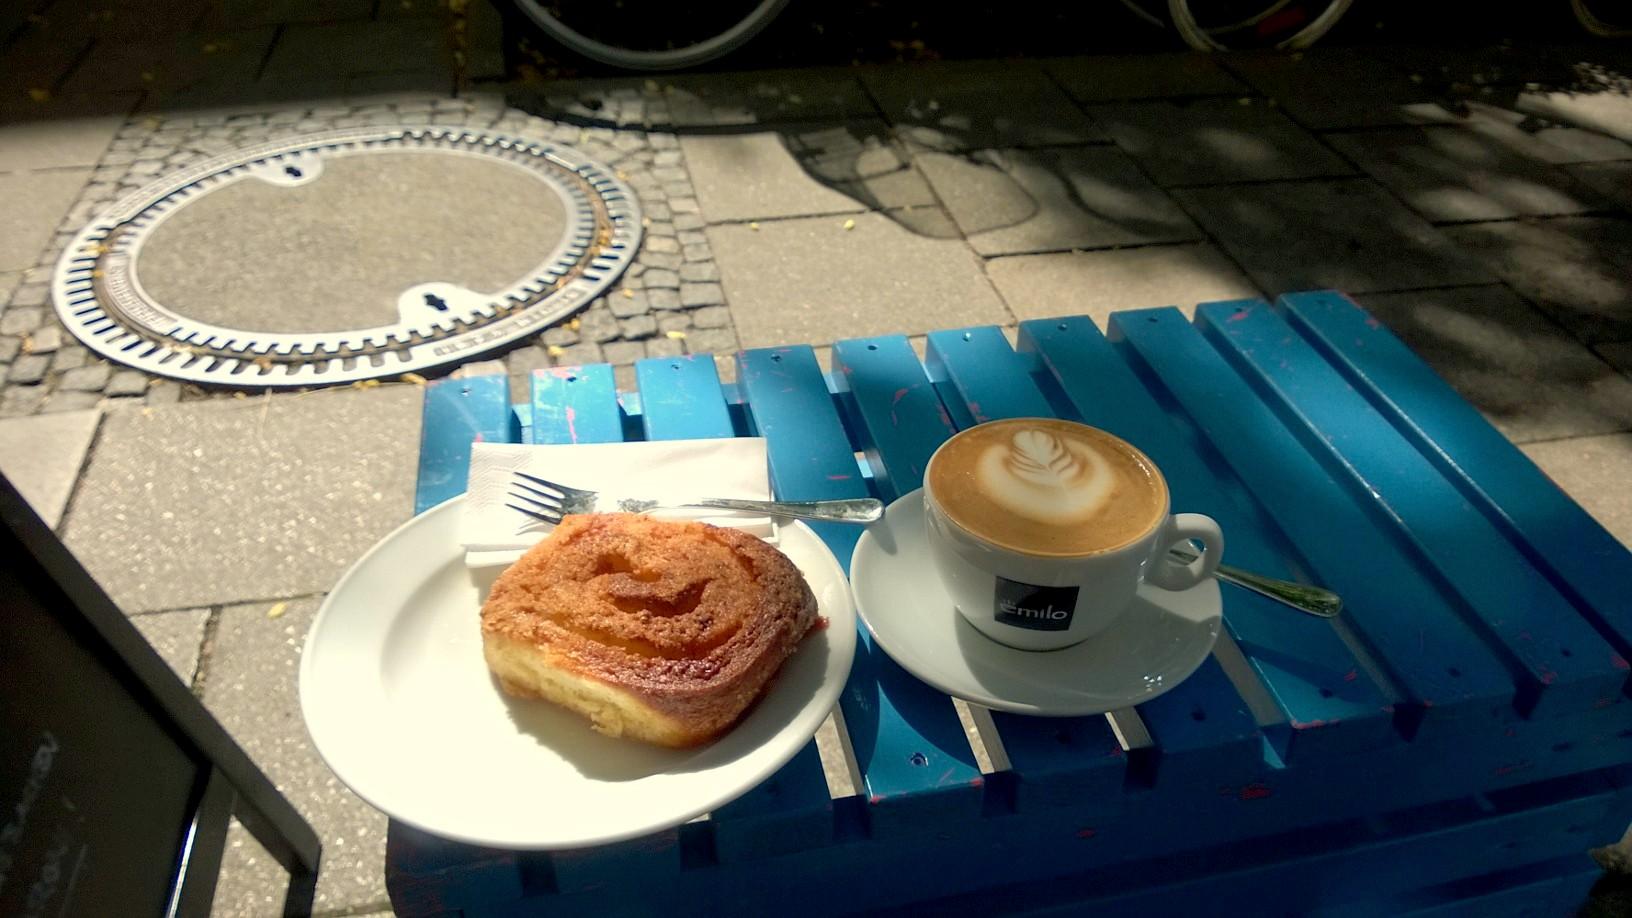 Emilo coffee Munich